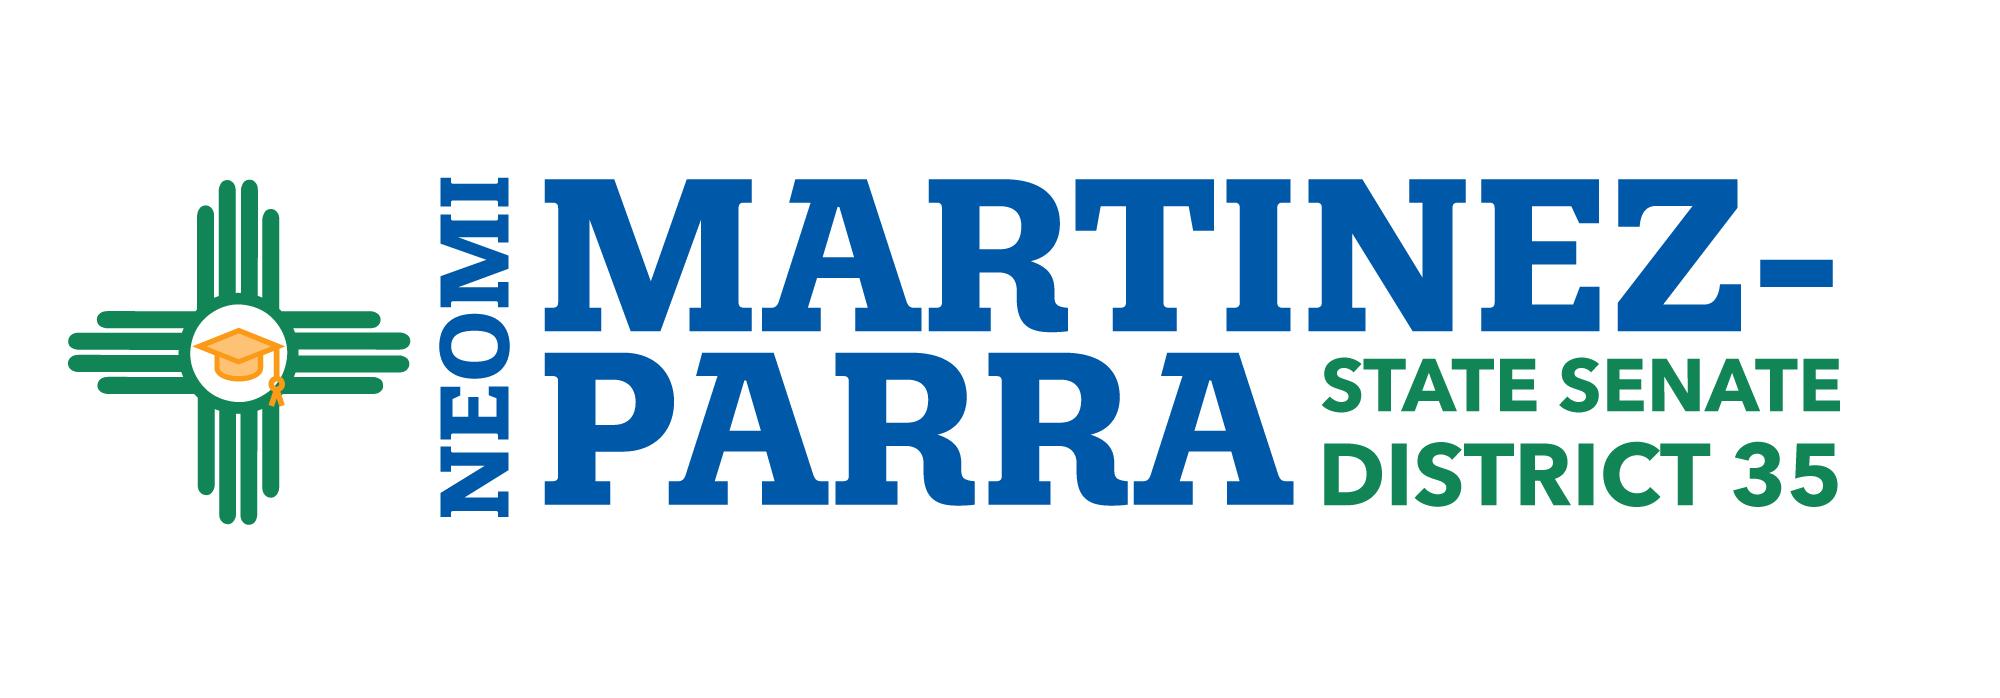 Neomi Martinez-Parra